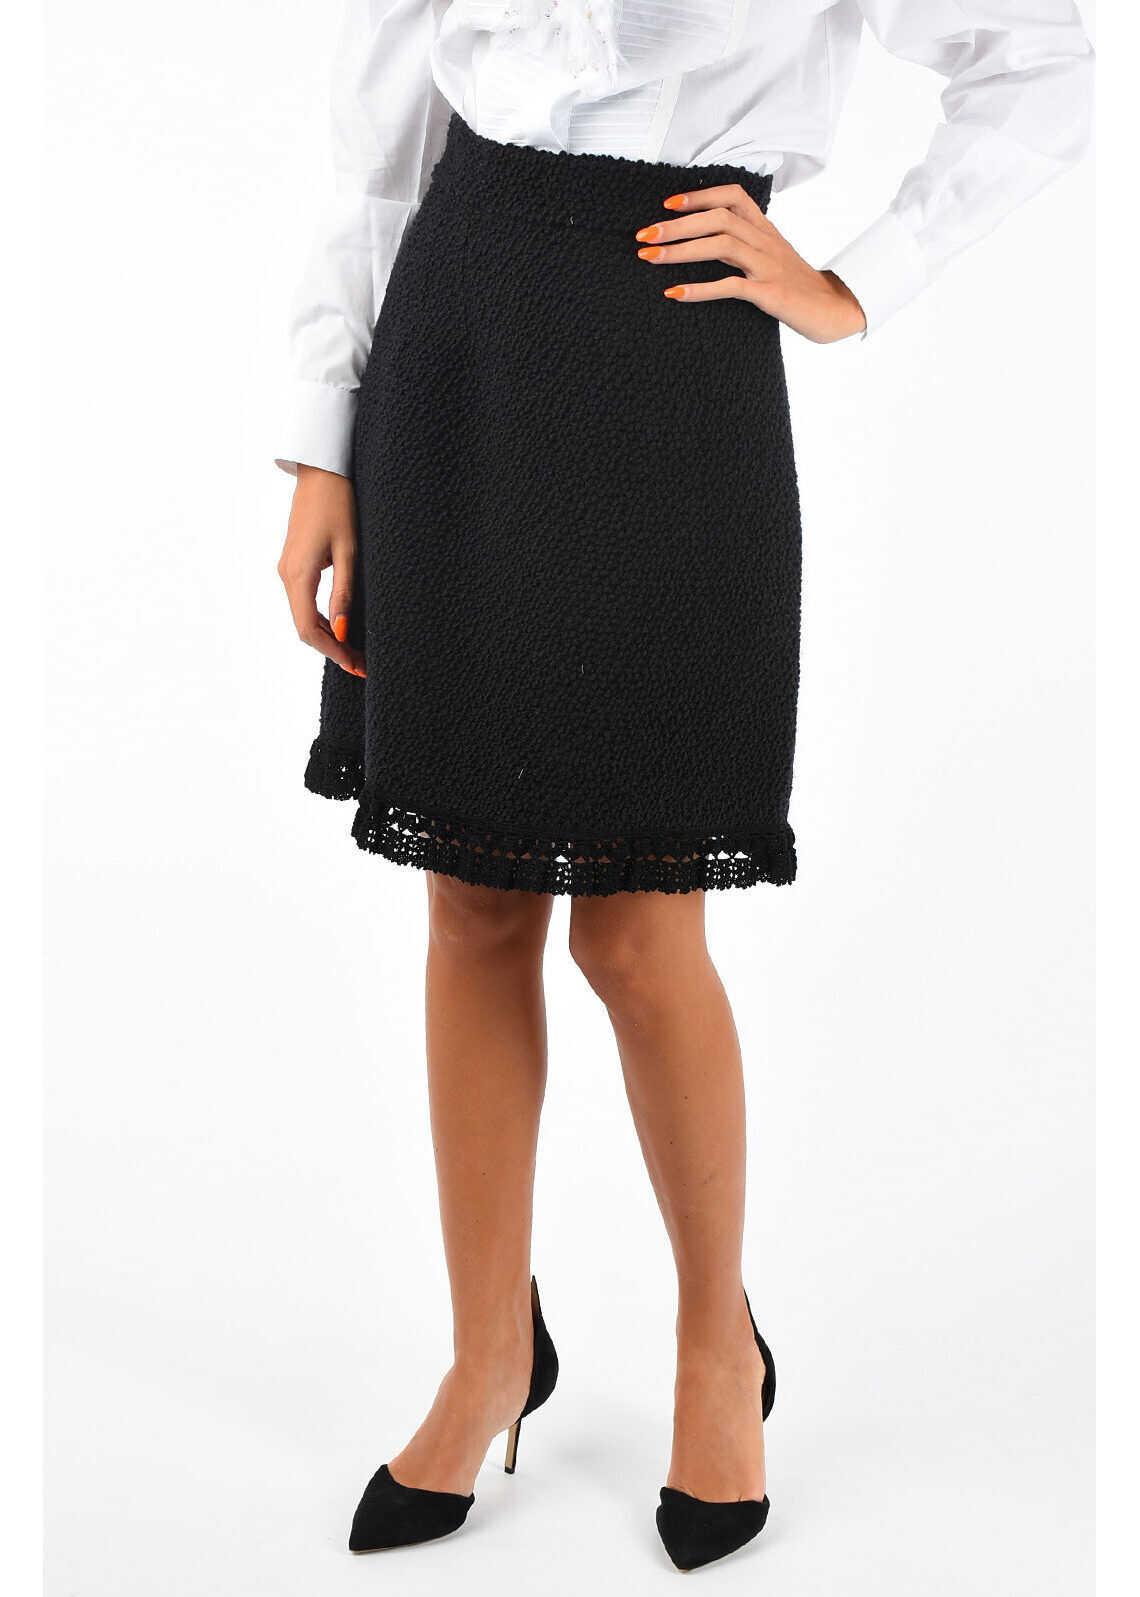 Dolce & Gabbana Silk and Virgin Wool Skirt BLACK